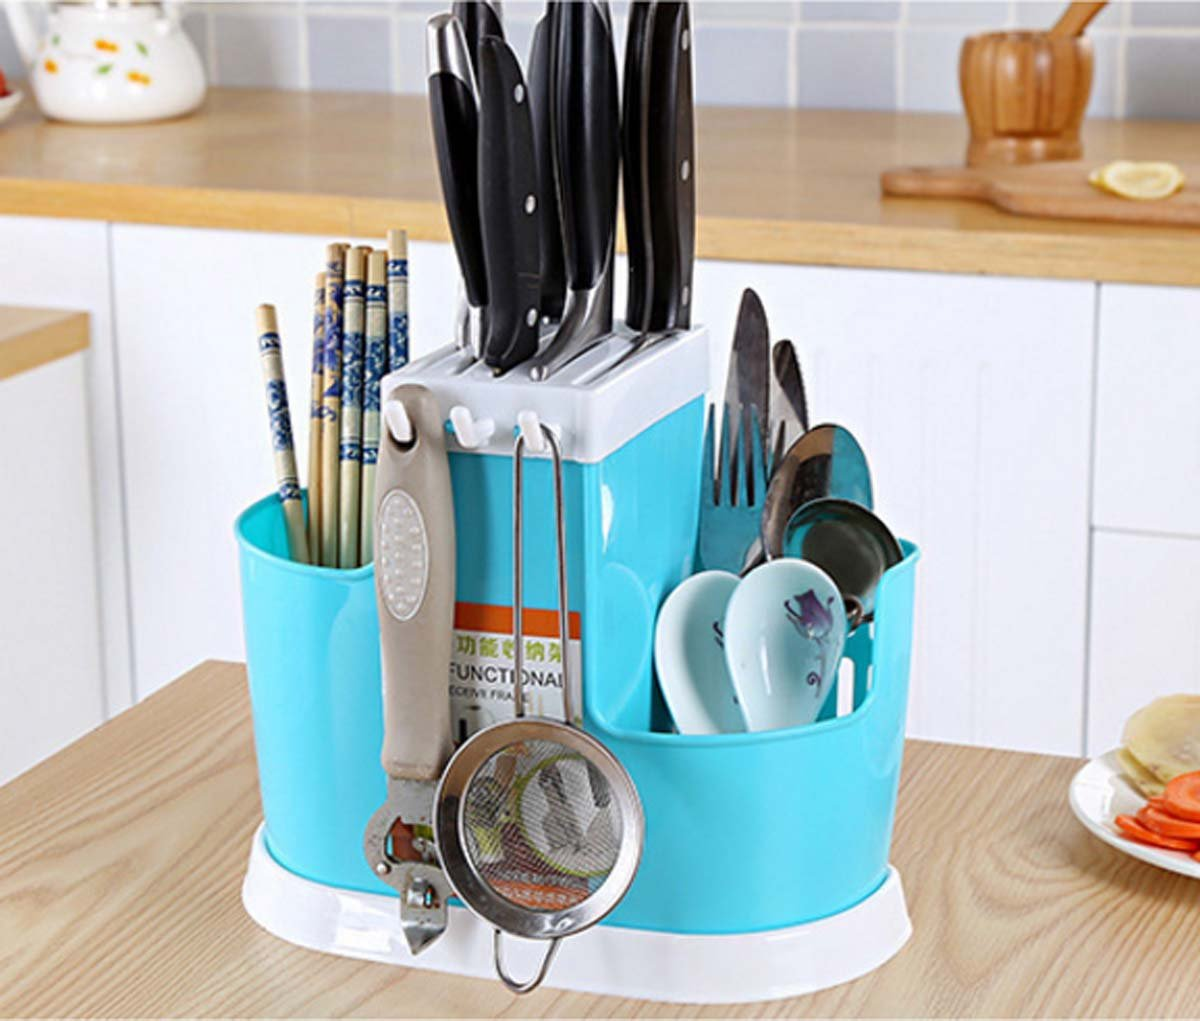 Groß Kreative Küchengerät Halter Bilder - Küche Set Ideen ...